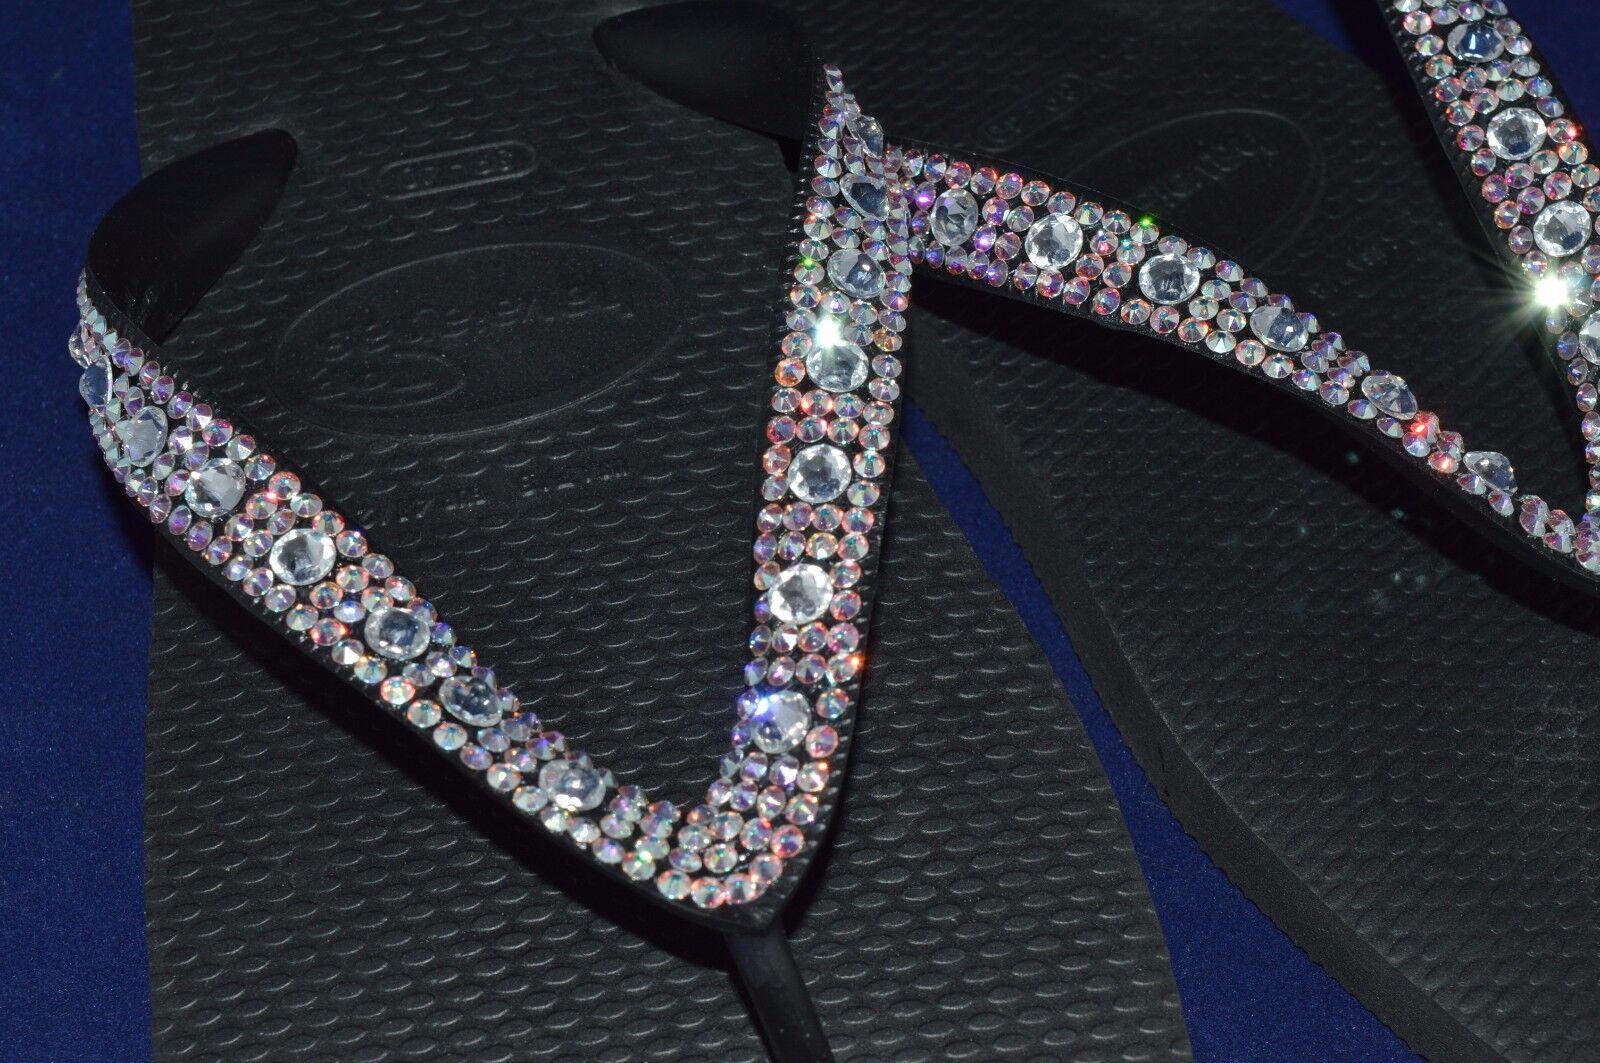 Havaianas Bling Diamond wedding flip flops flops flops made with SWAROVSKI Elements crystal 3c206b